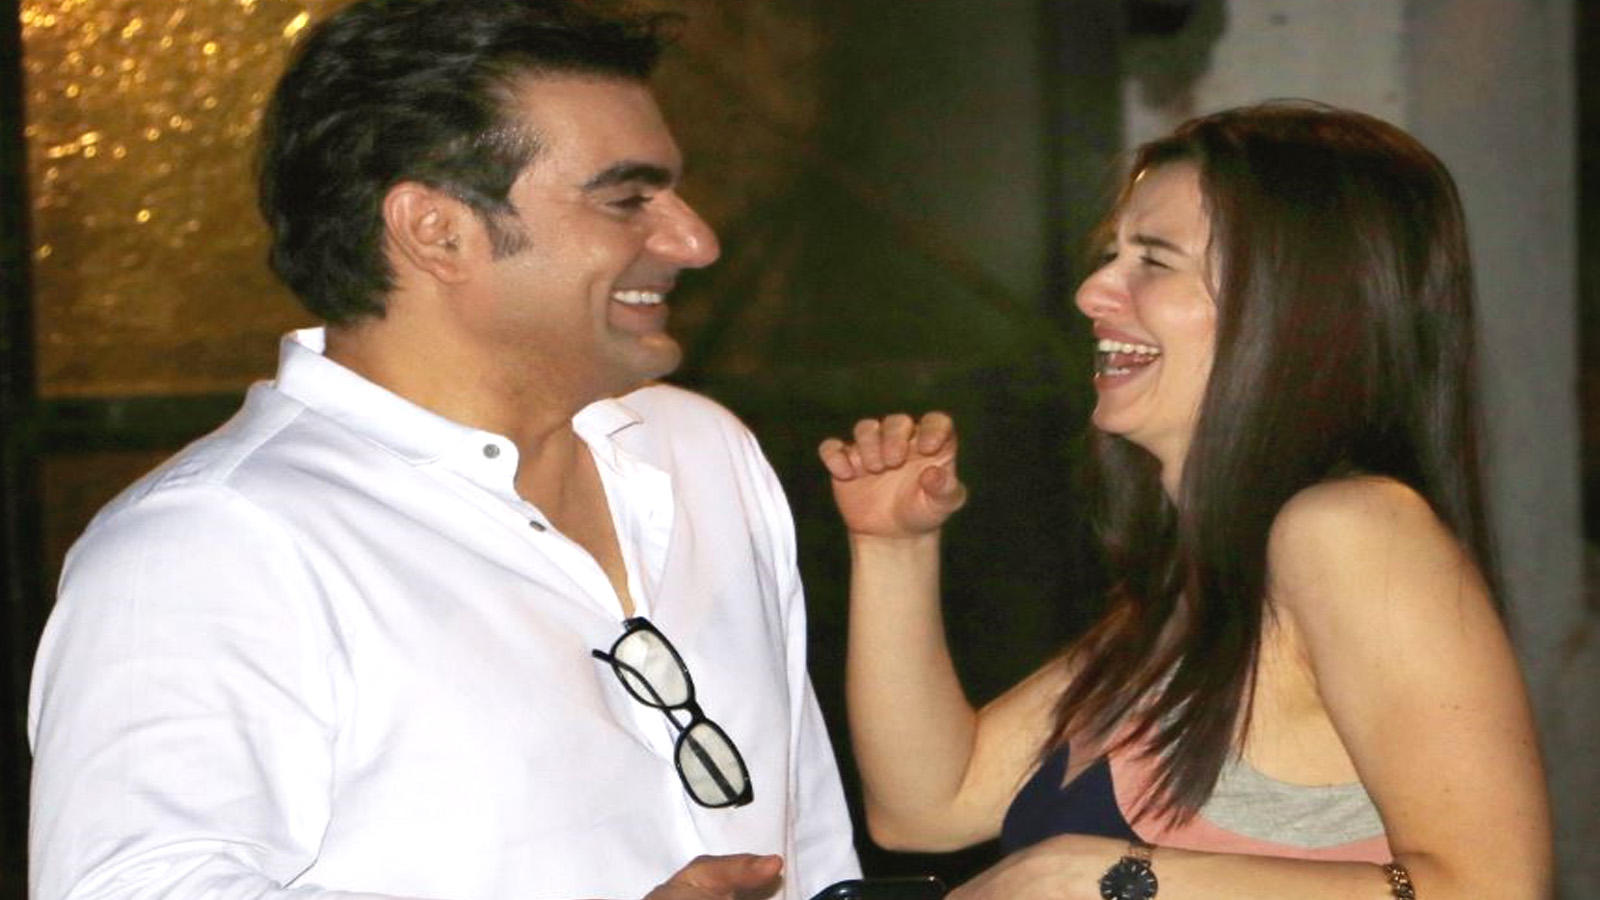 Arbaaz Khan celebrates rumoured girlfriend Giorgia Andriani's birthday